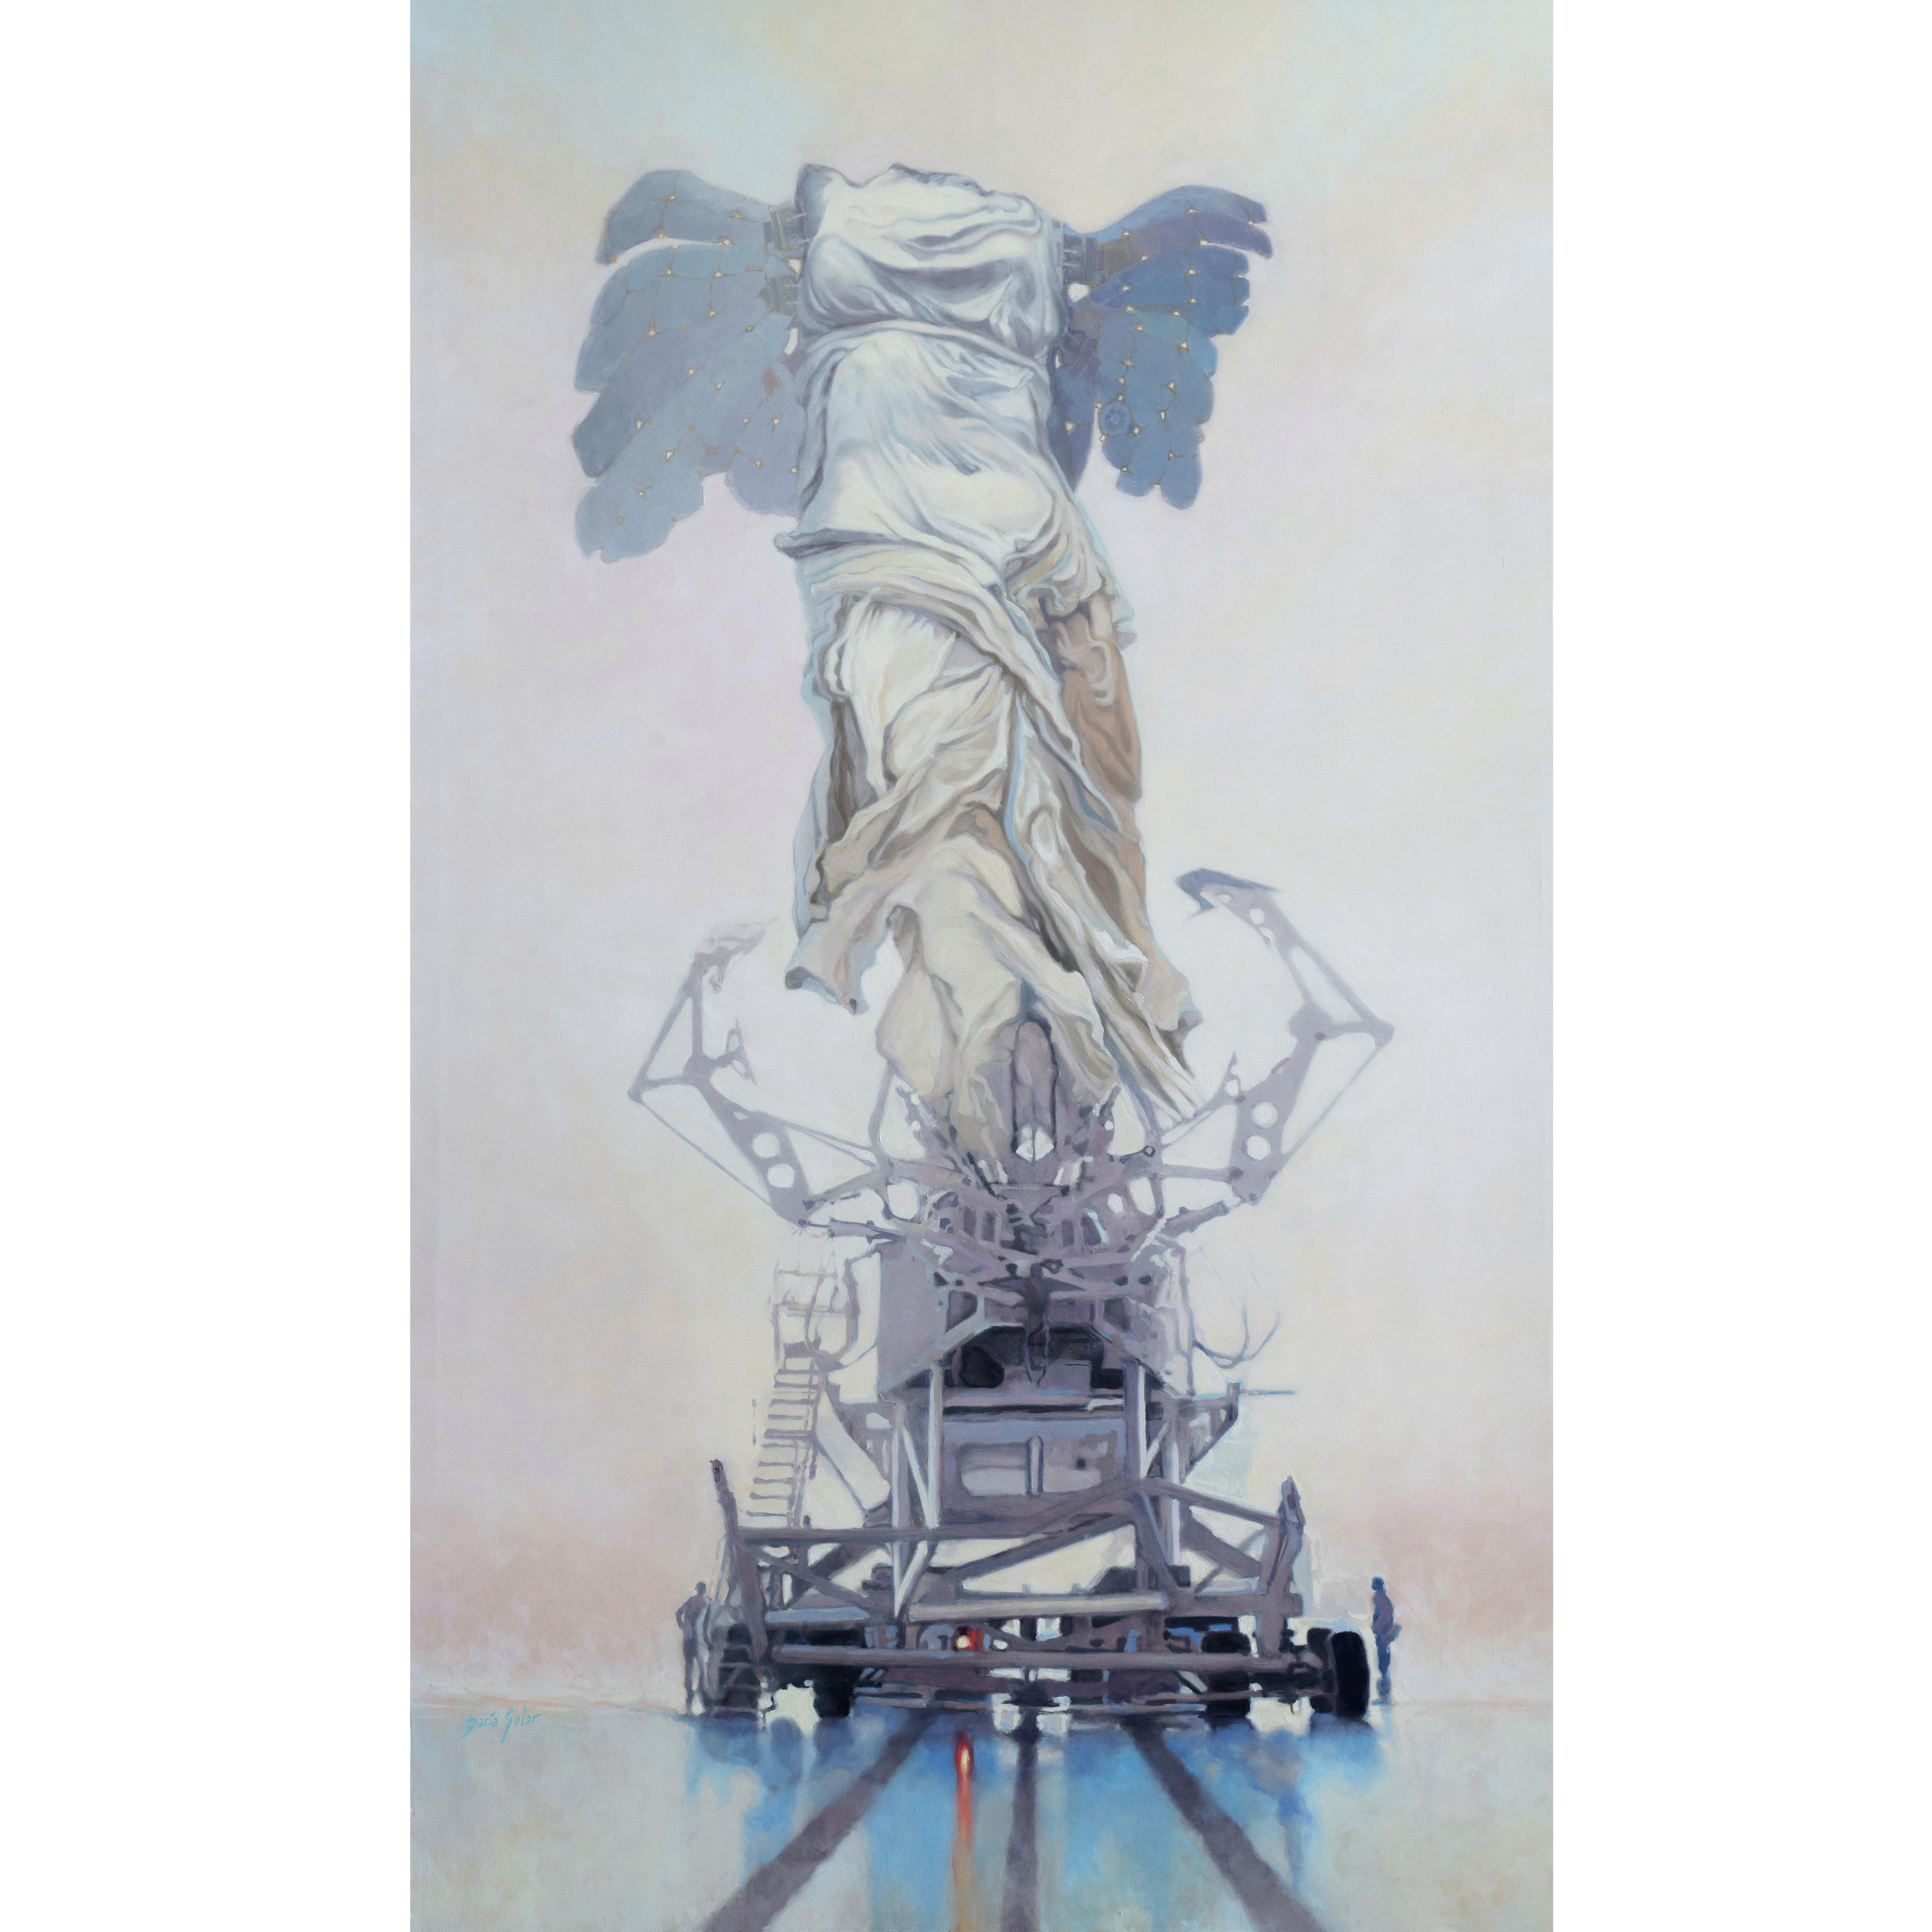 NIKE INSTA Daria Solar 220x120 oil on canvas 2020